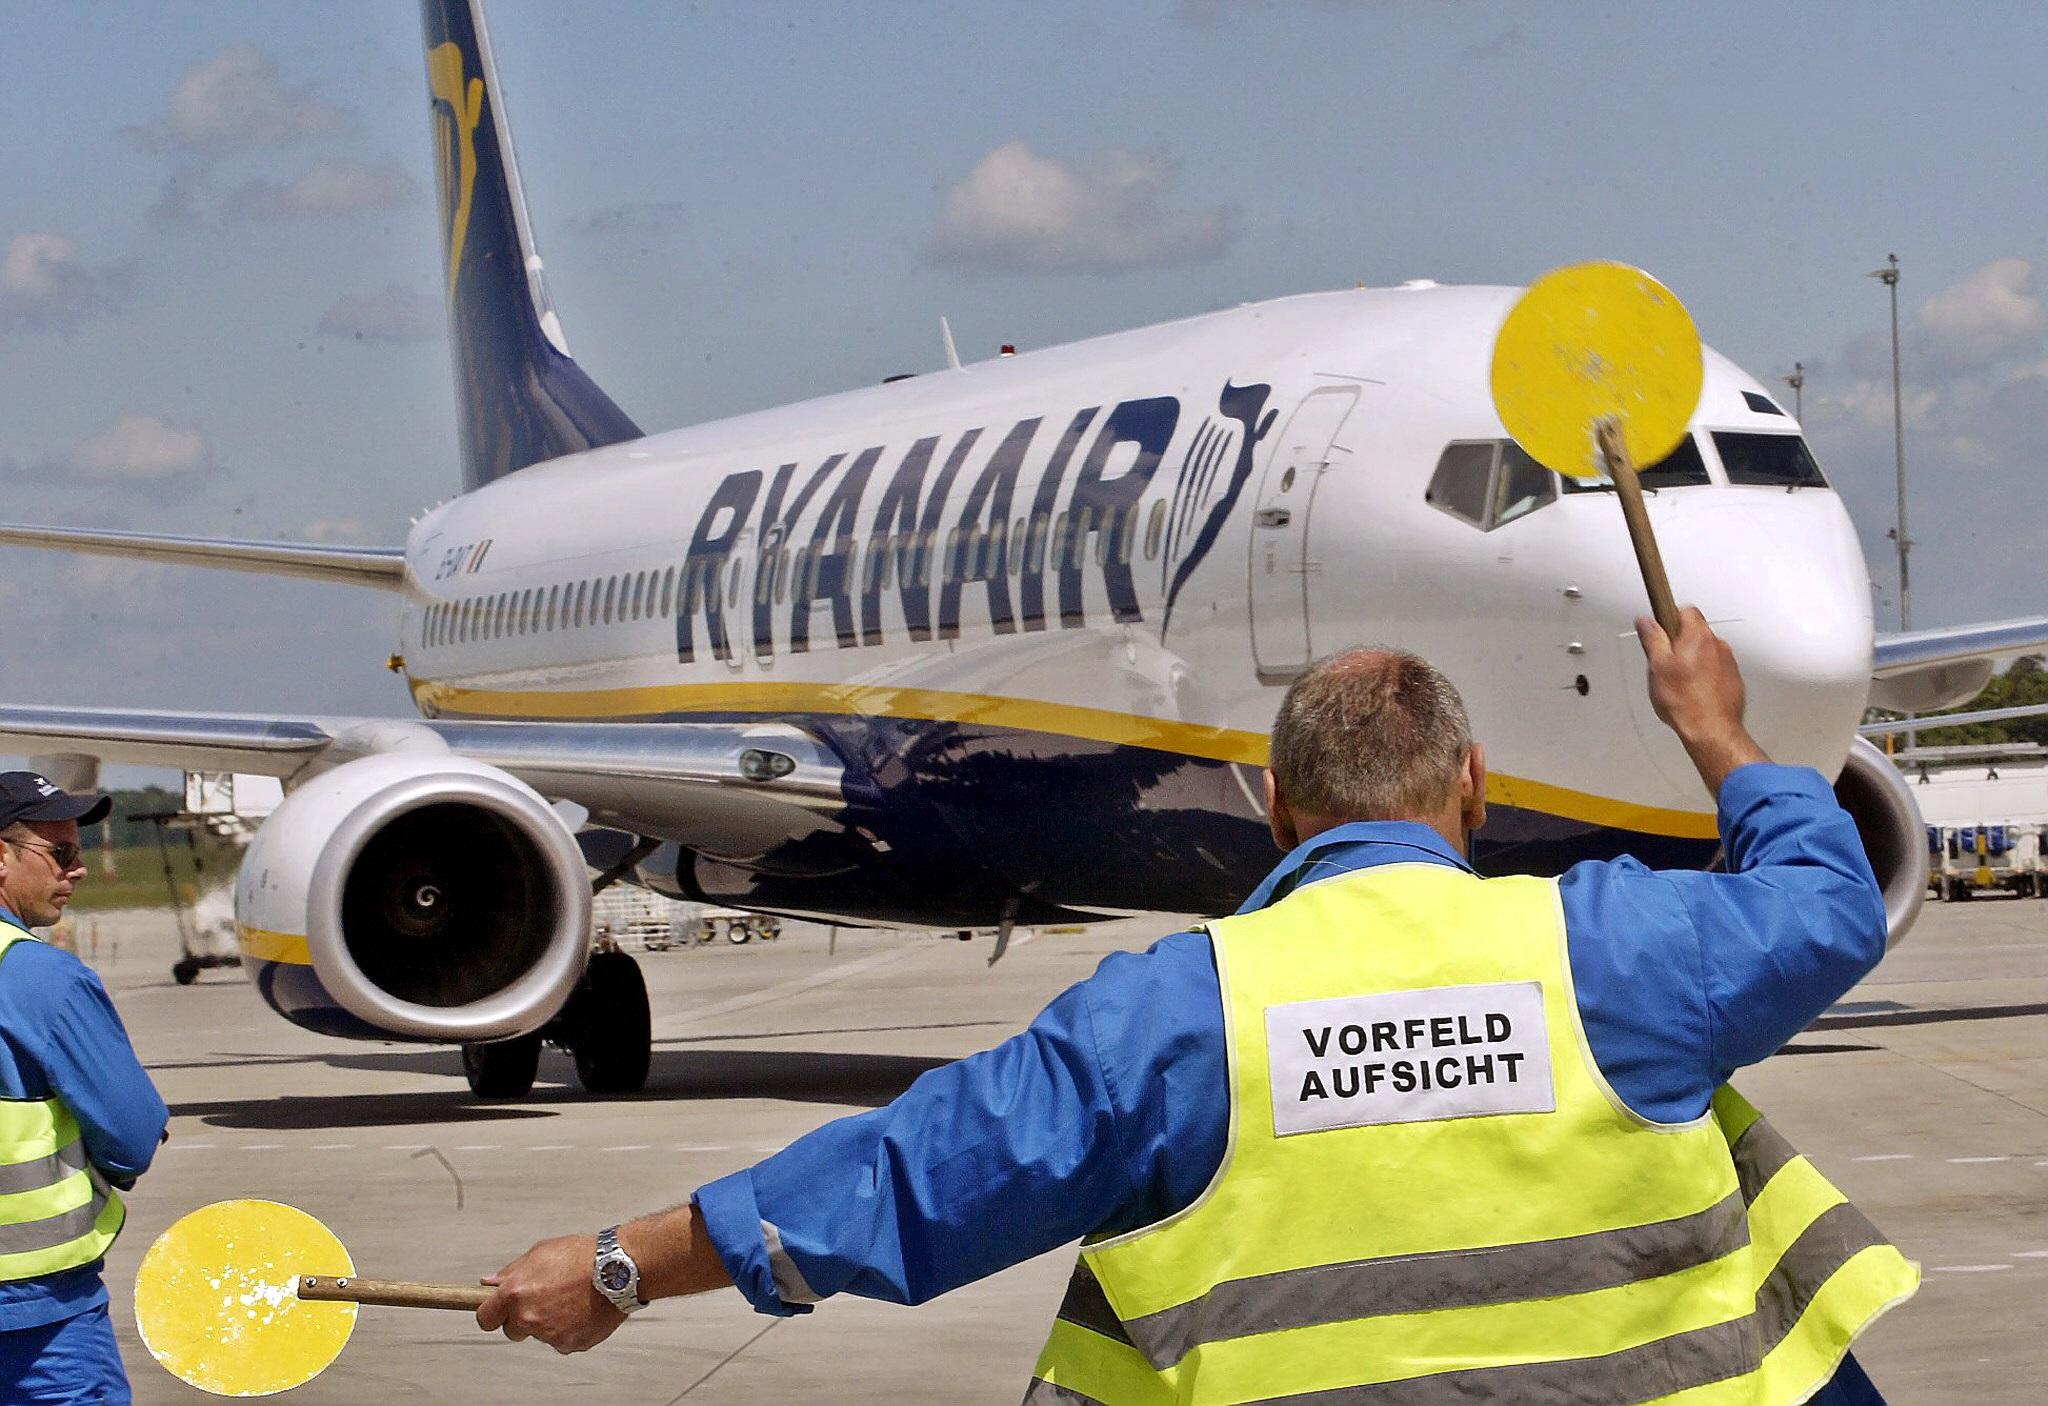 Vertenza Ryanair, Trapani preoccupata